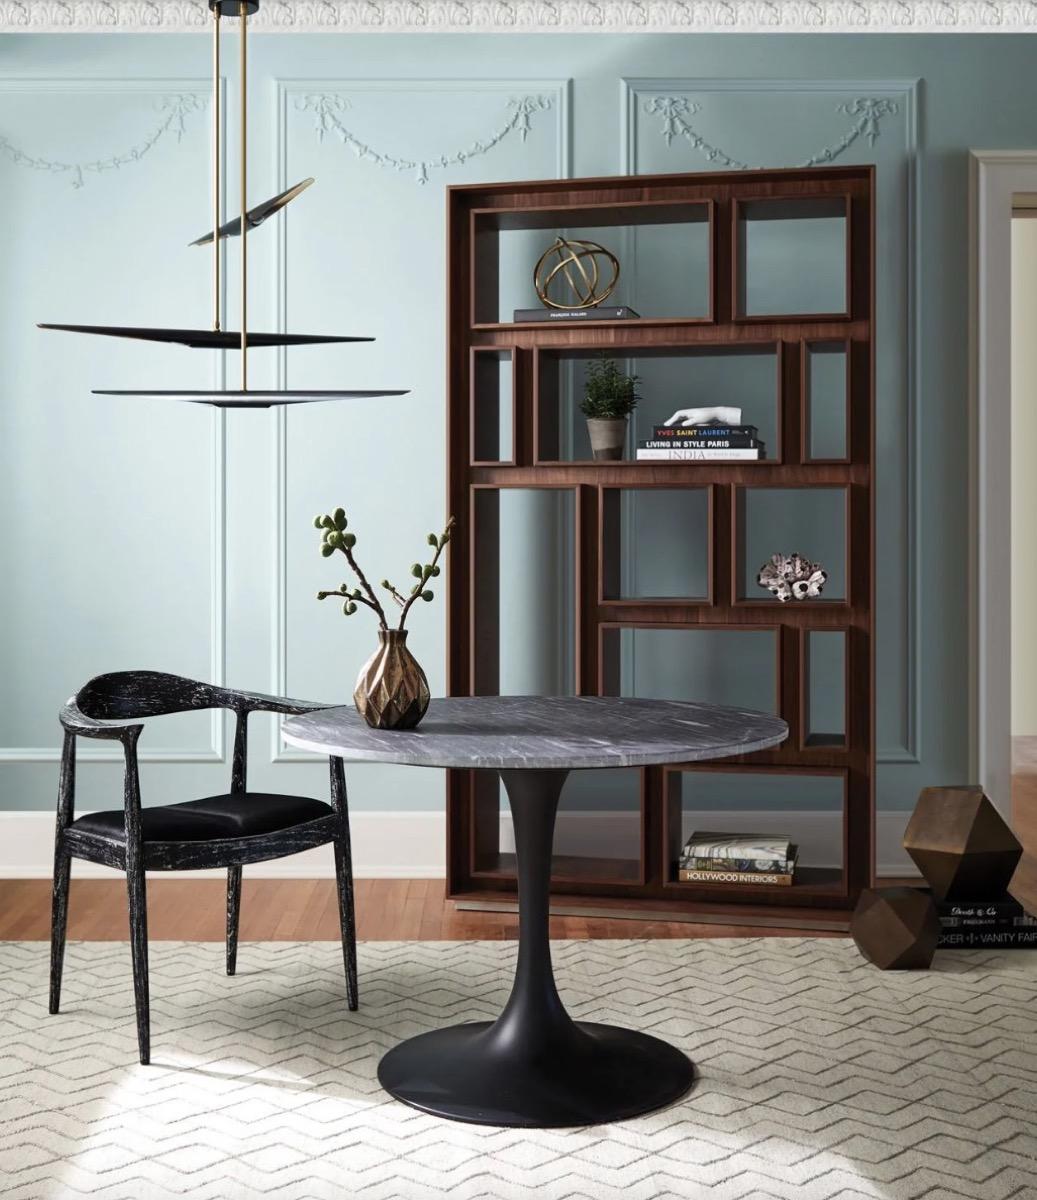 Jayson Home Tetris-Like Bookshelf Storage Furniture